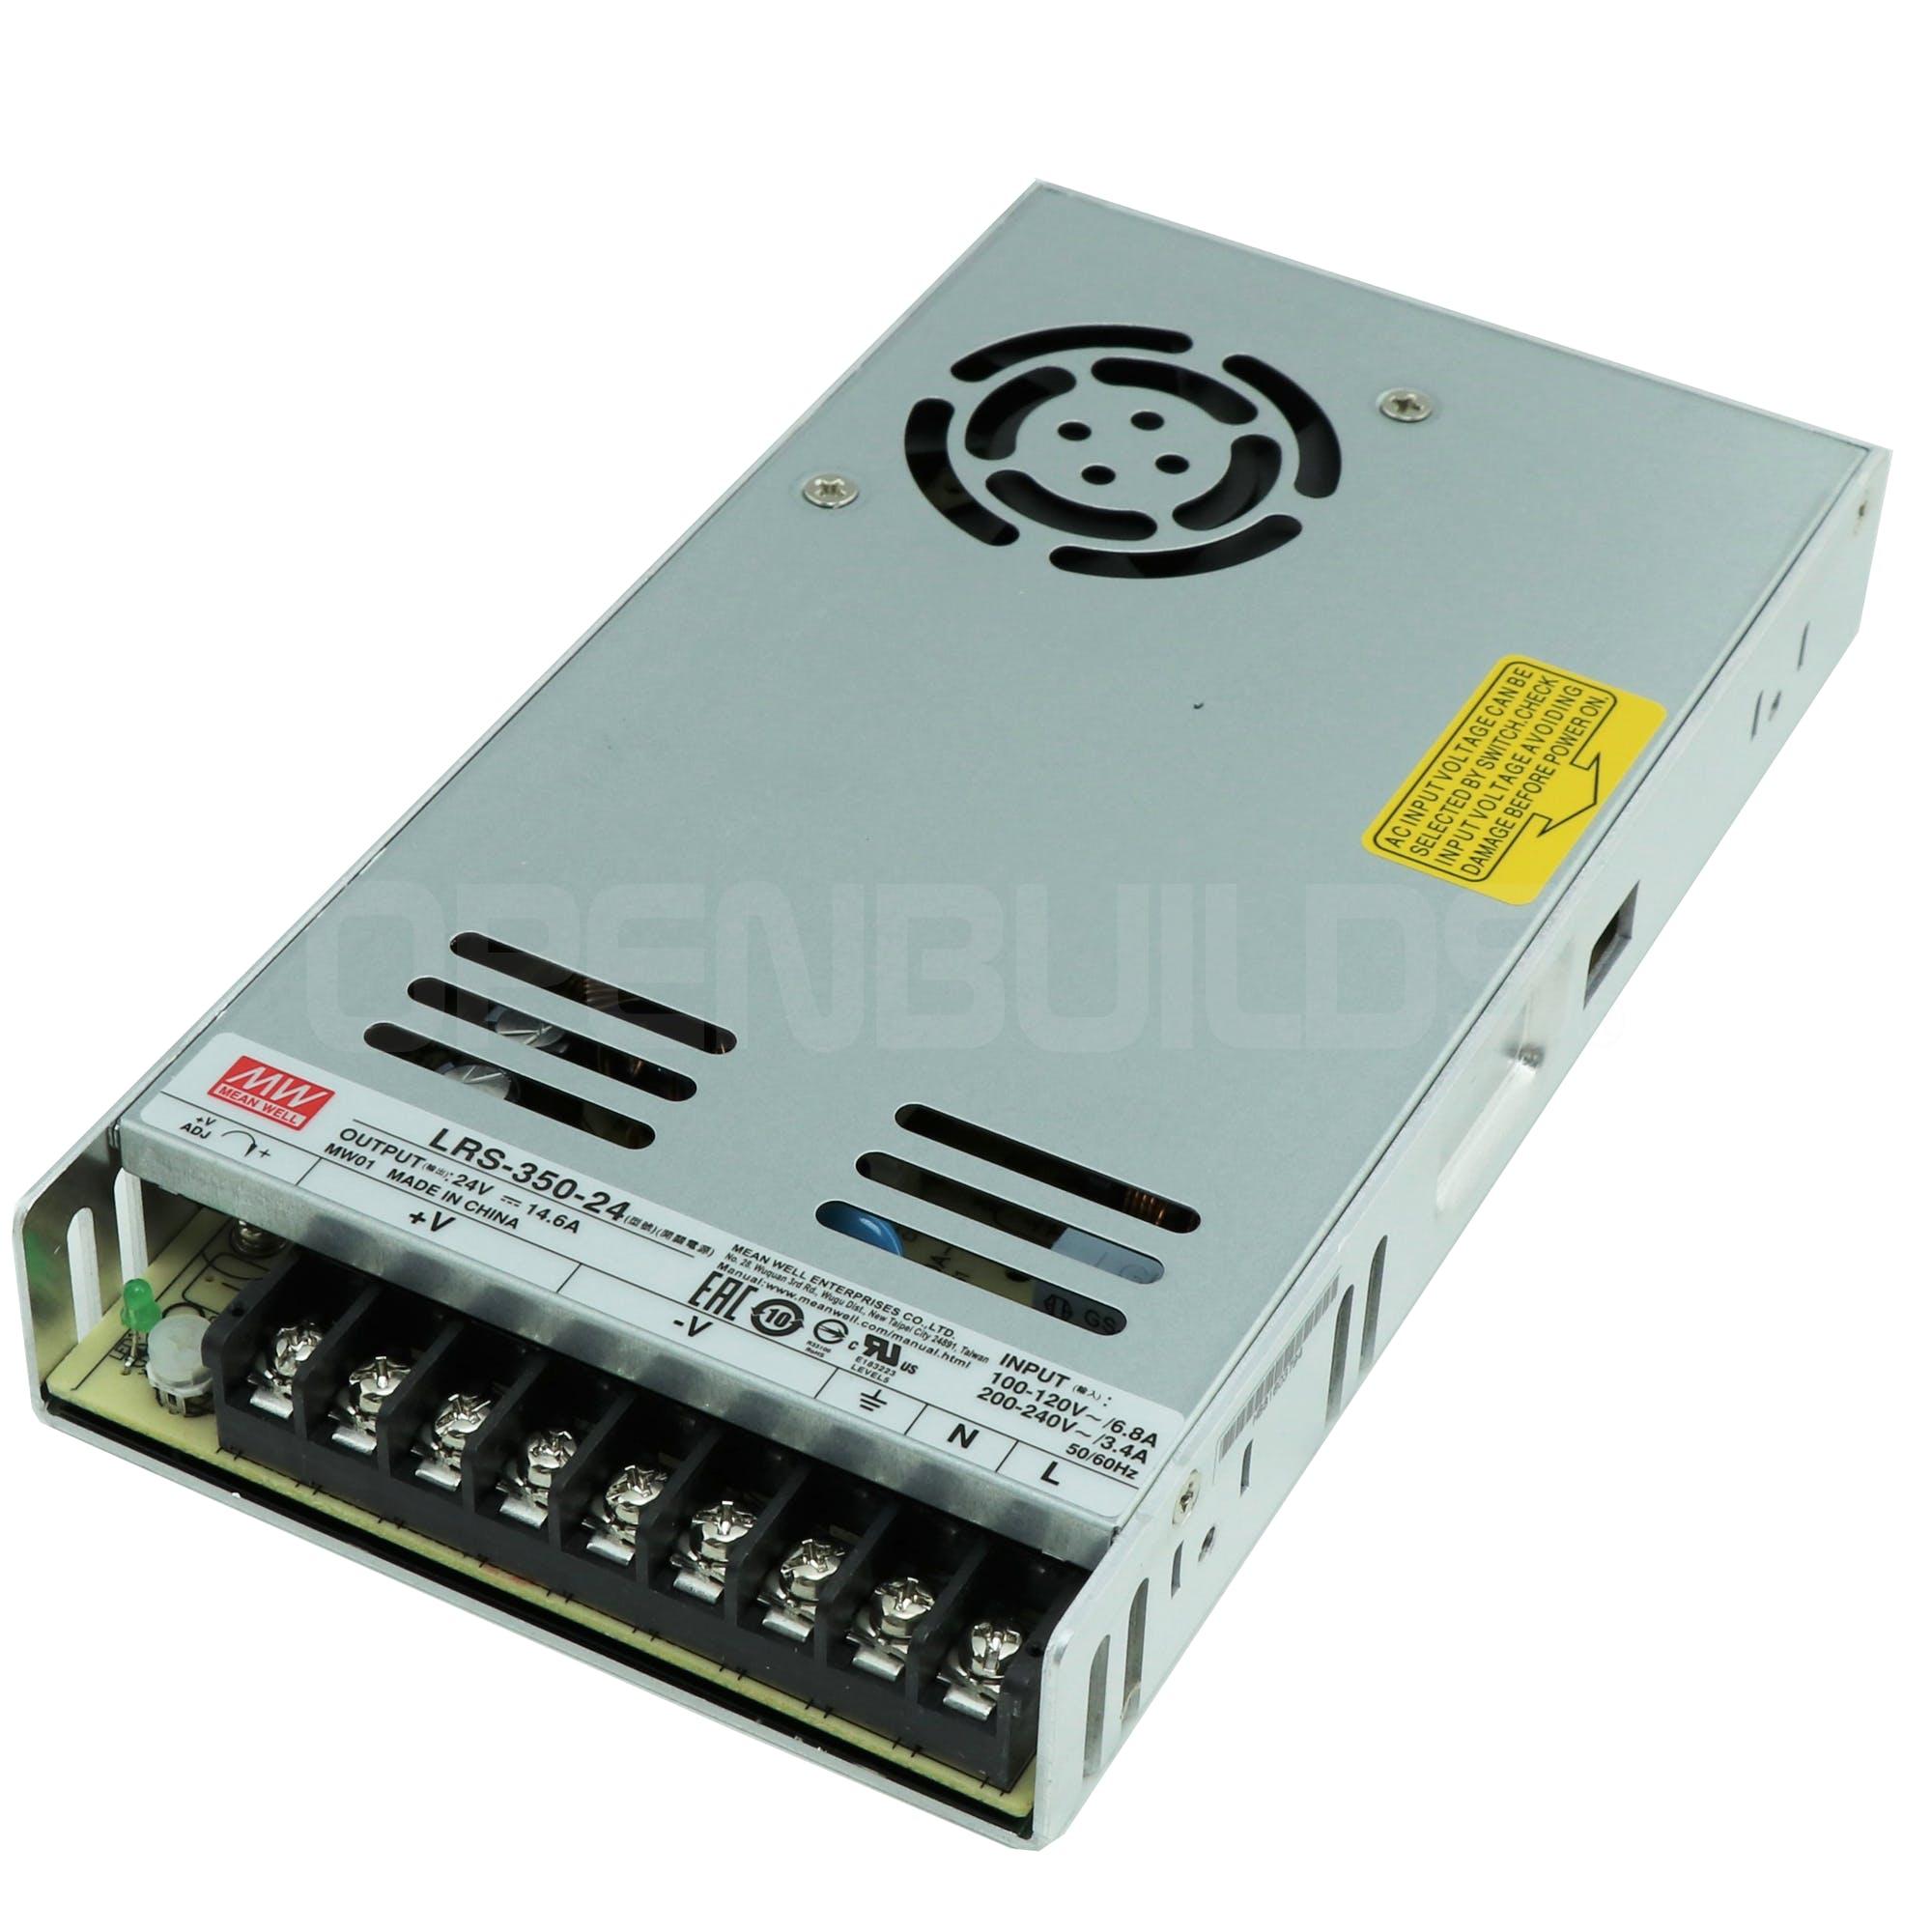 24V/14.6A Power Supply